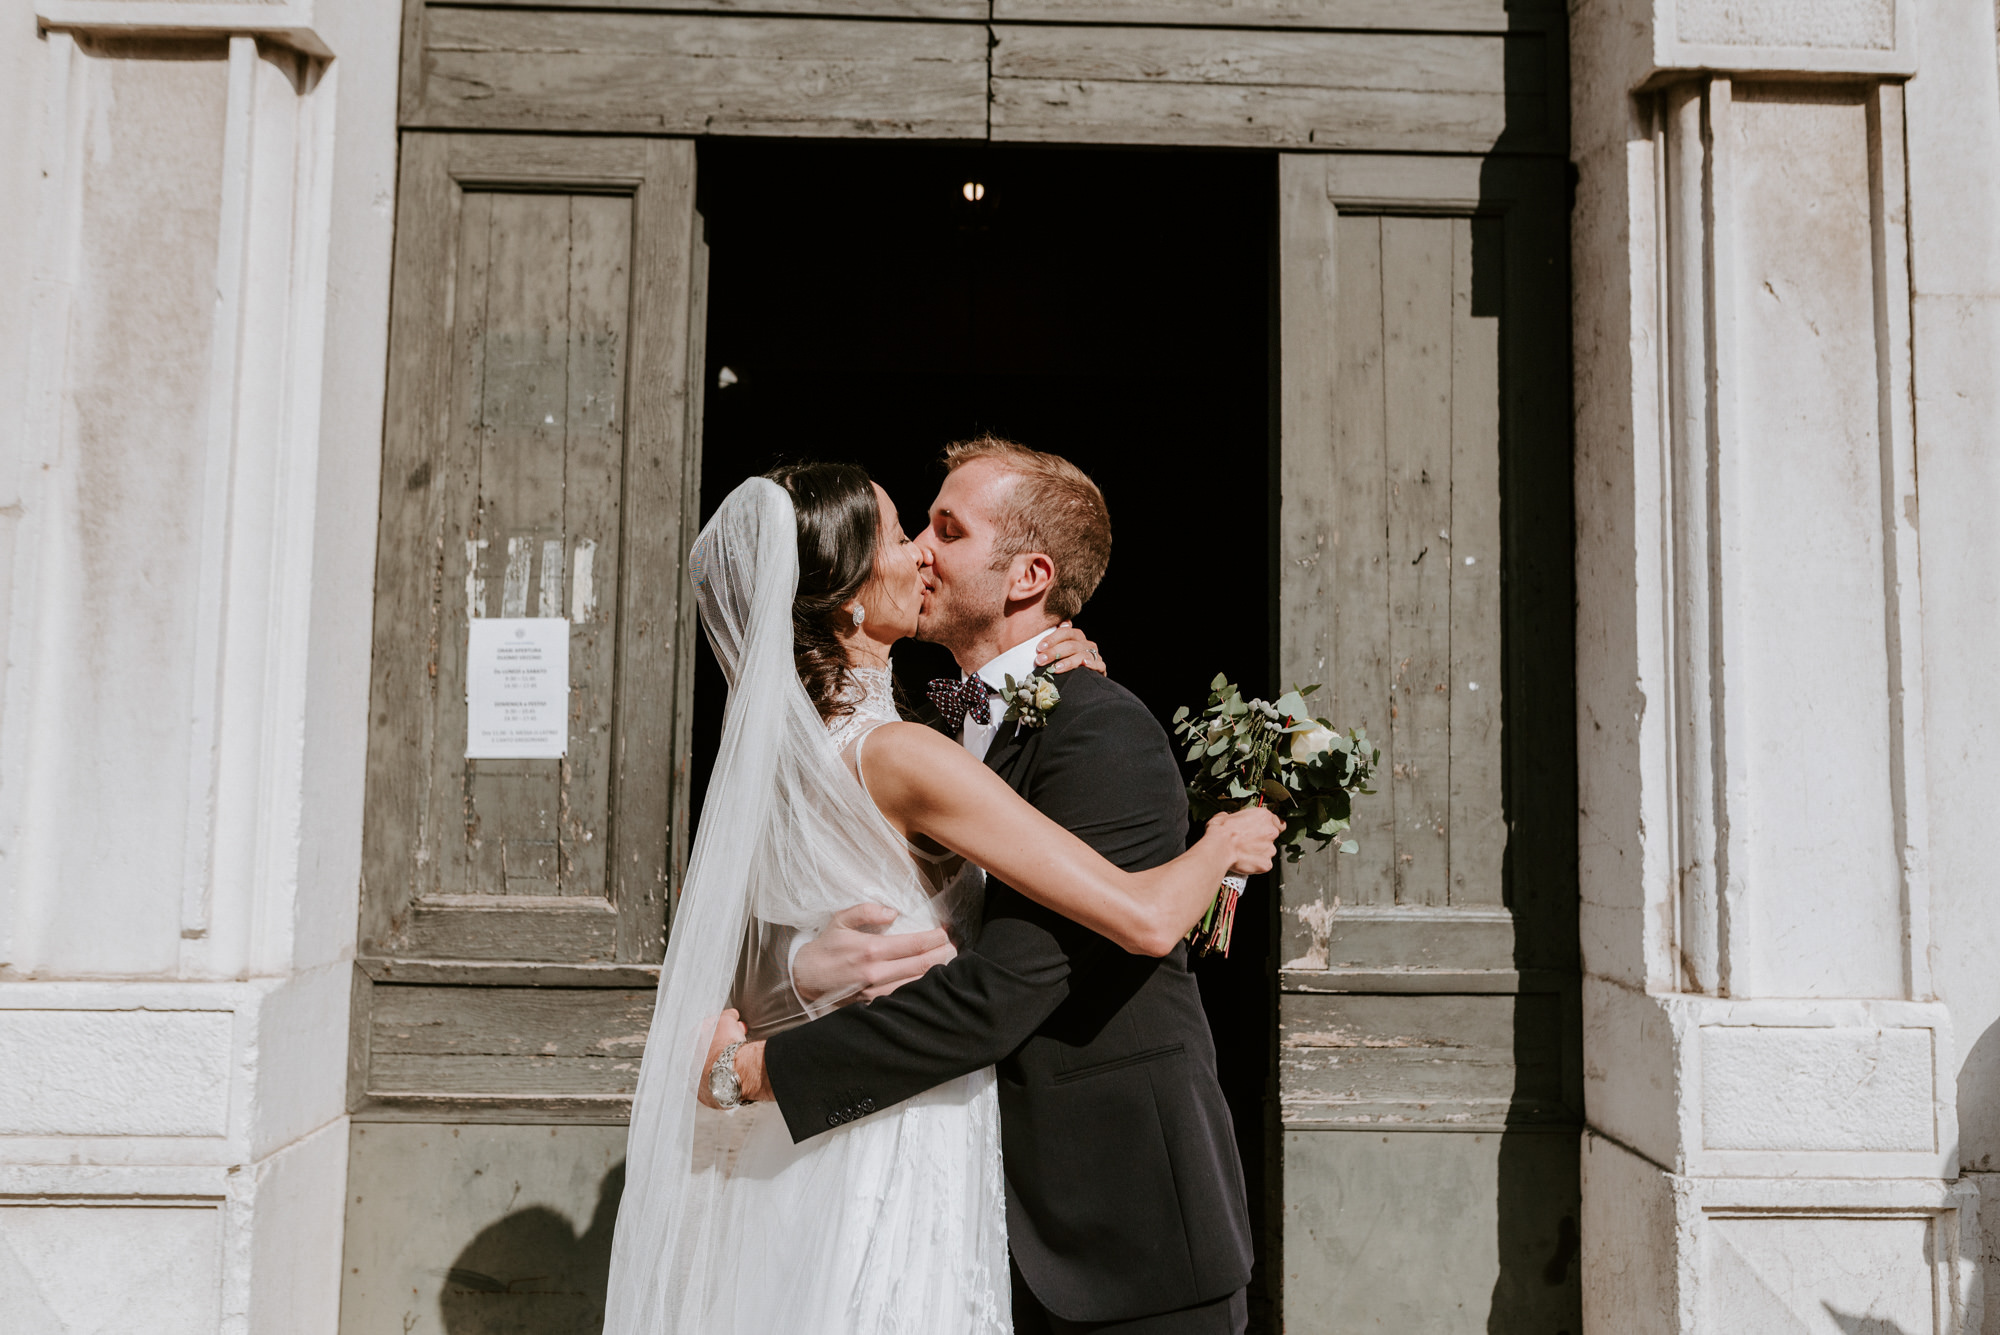 FOTO+PHOTO+BODA+WEDDING+ITALIA+ITALY+MAURICIO+GARAY+MAURICIOGARAY+WEDDINPHOTOGRAPHER+FOTOGRAFODEBODA-1069.jpg